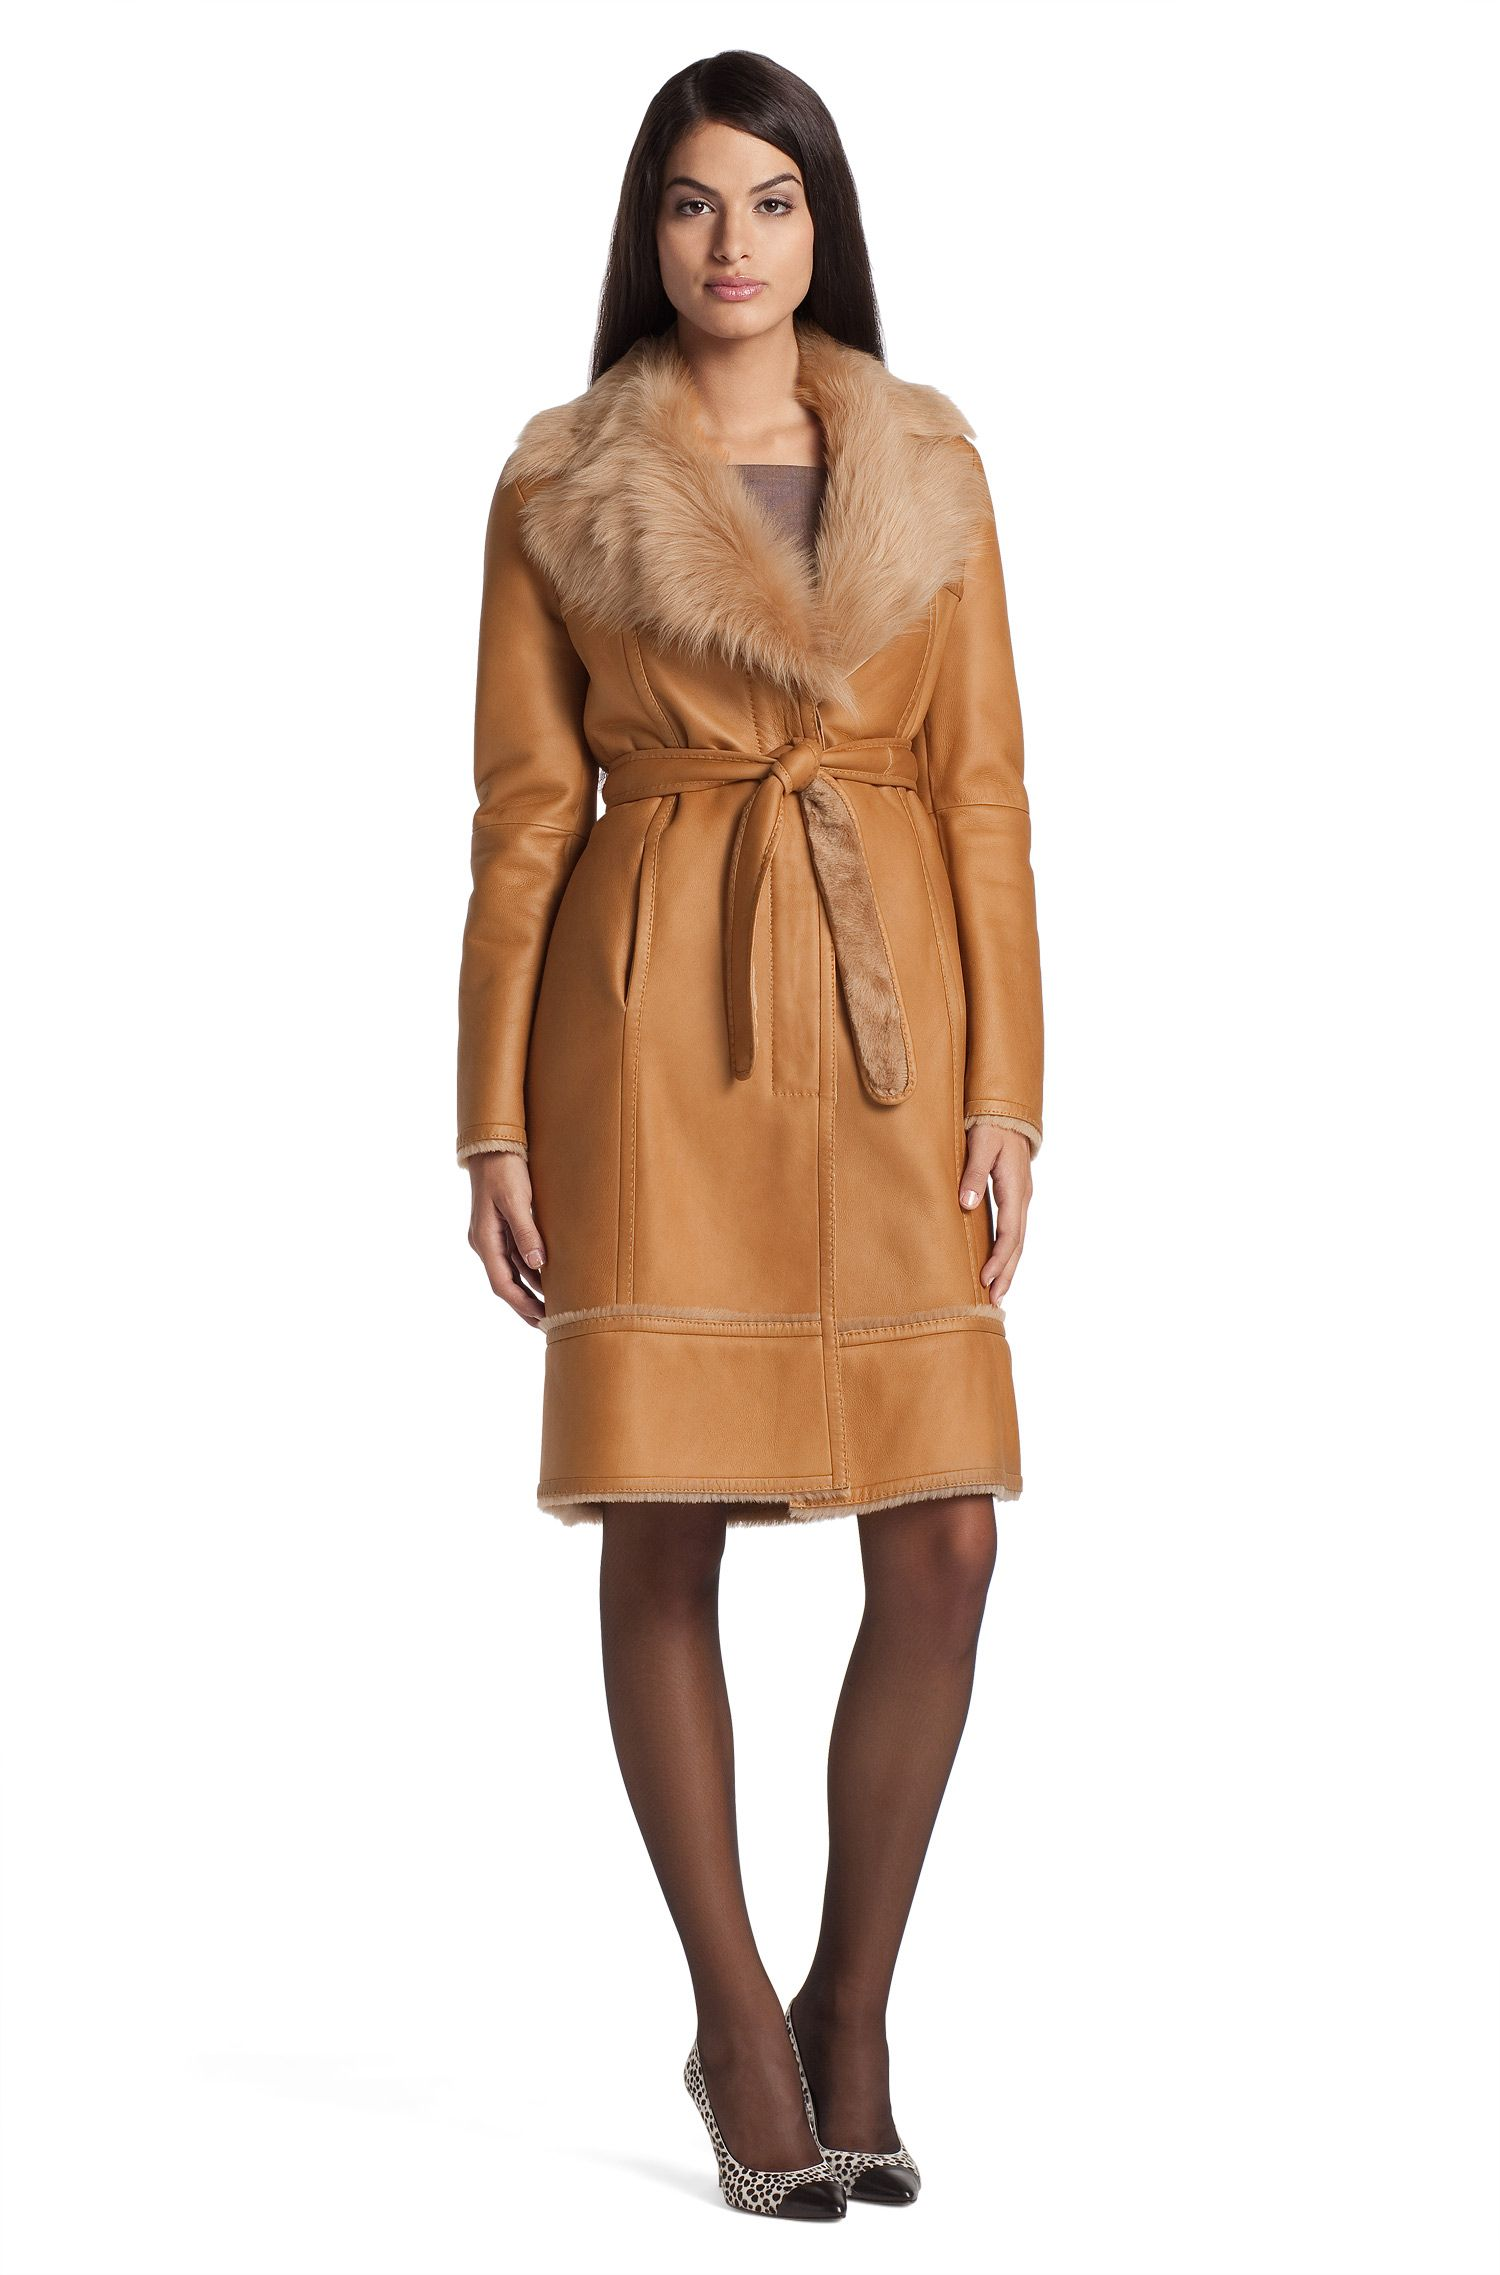 Mantel ´LE775` aus reinem Lammleder